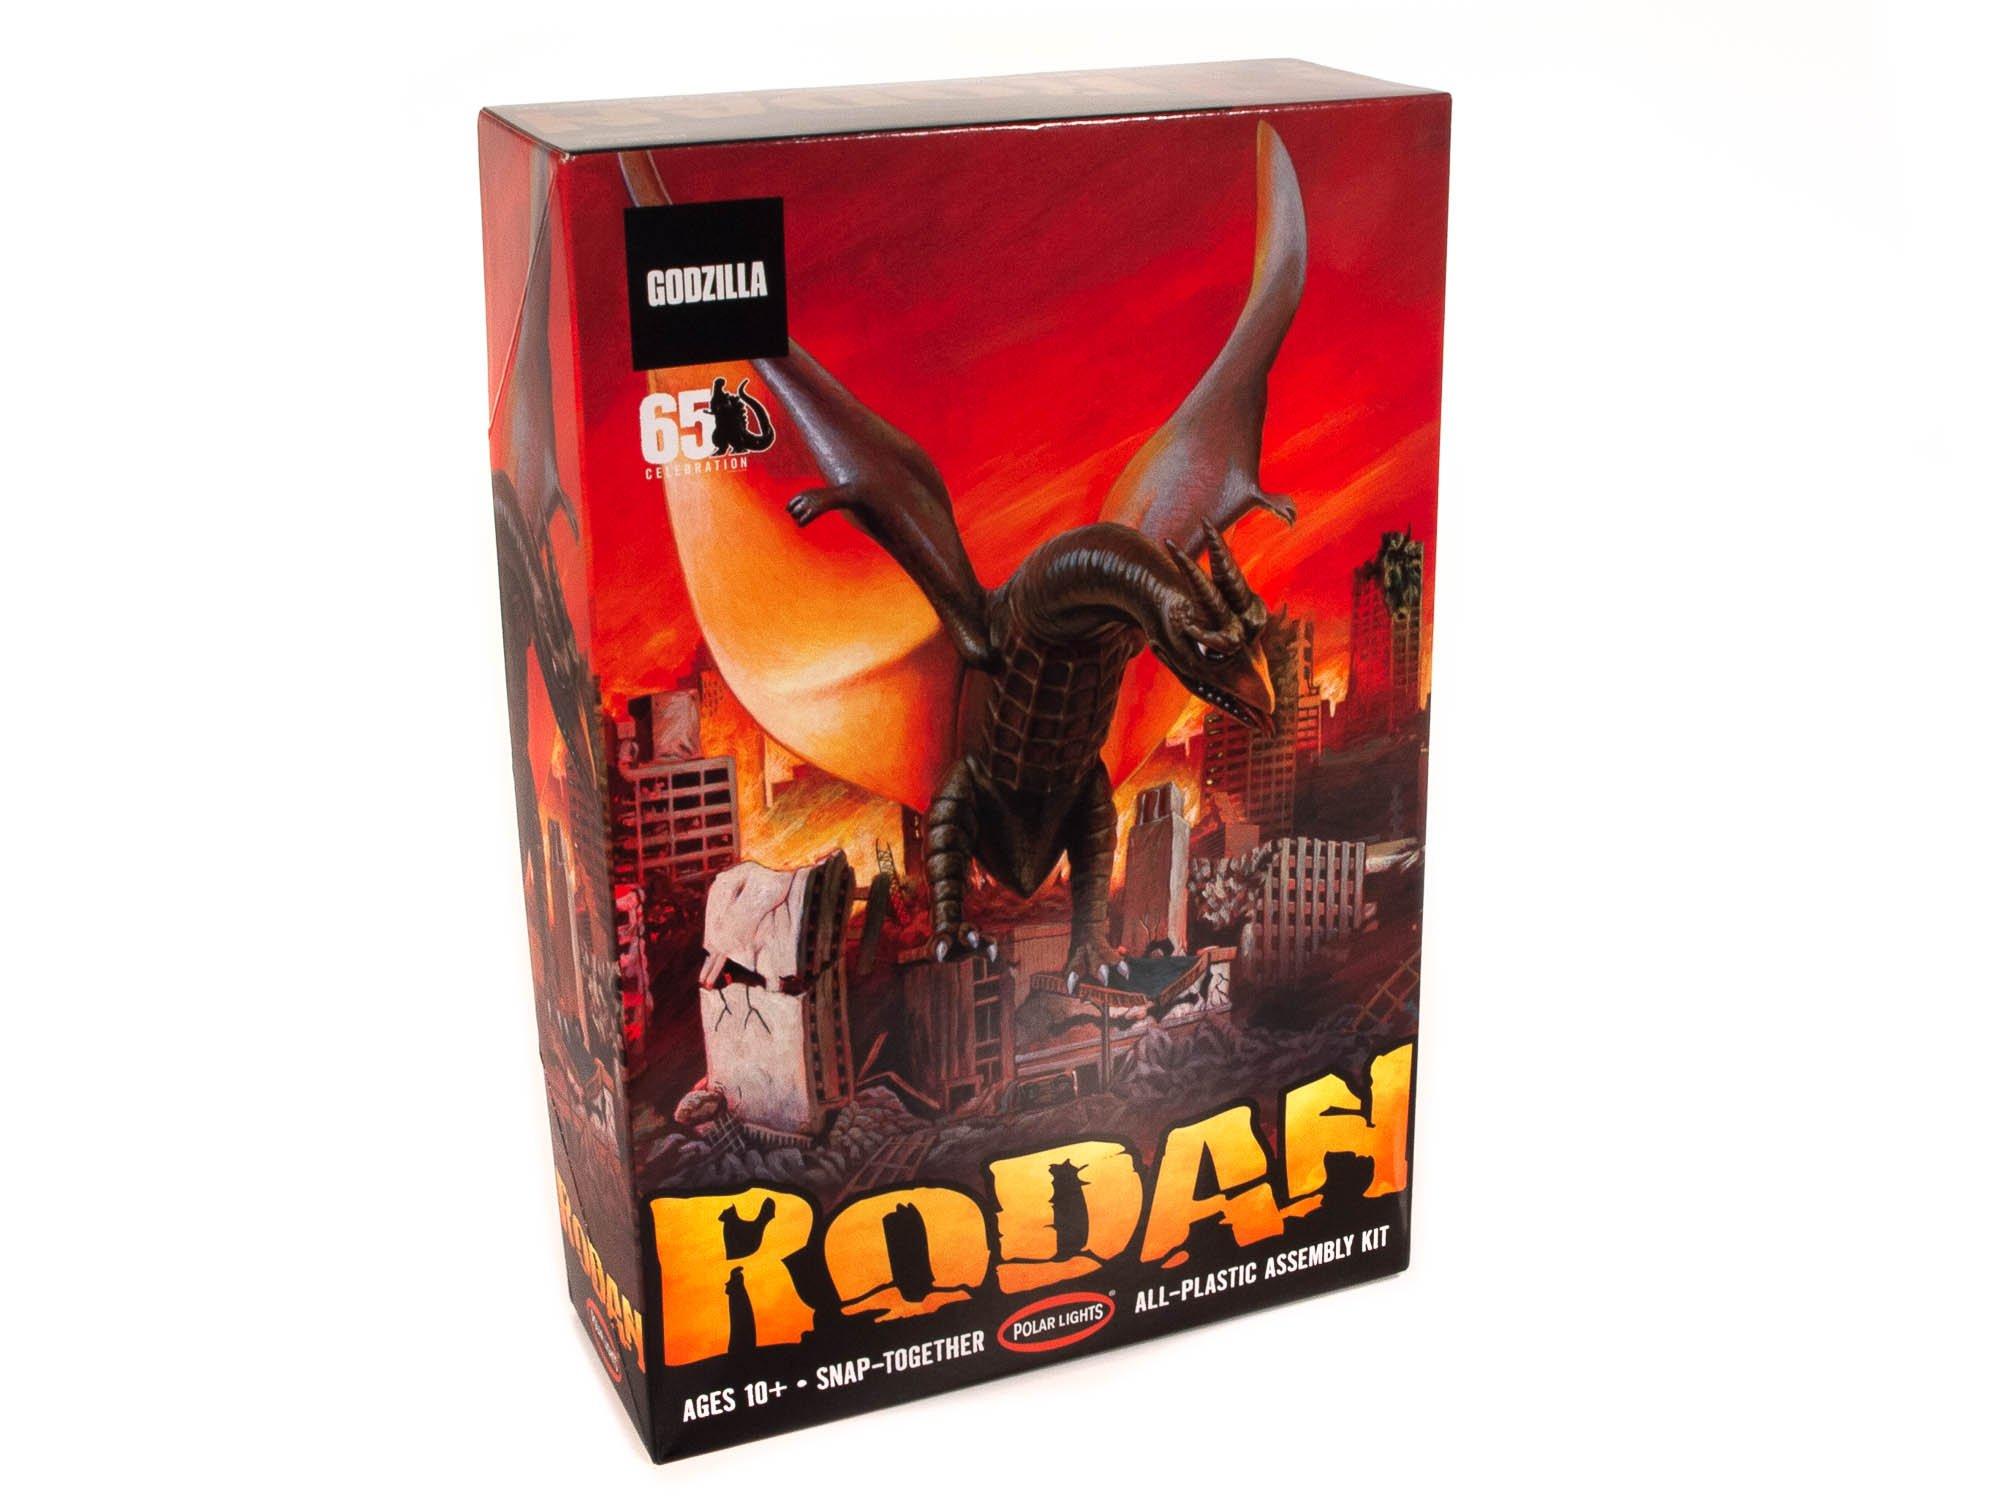 POLAR LIGHTS RODAN (SNAP) 1:800 SCALE MODEL KIT